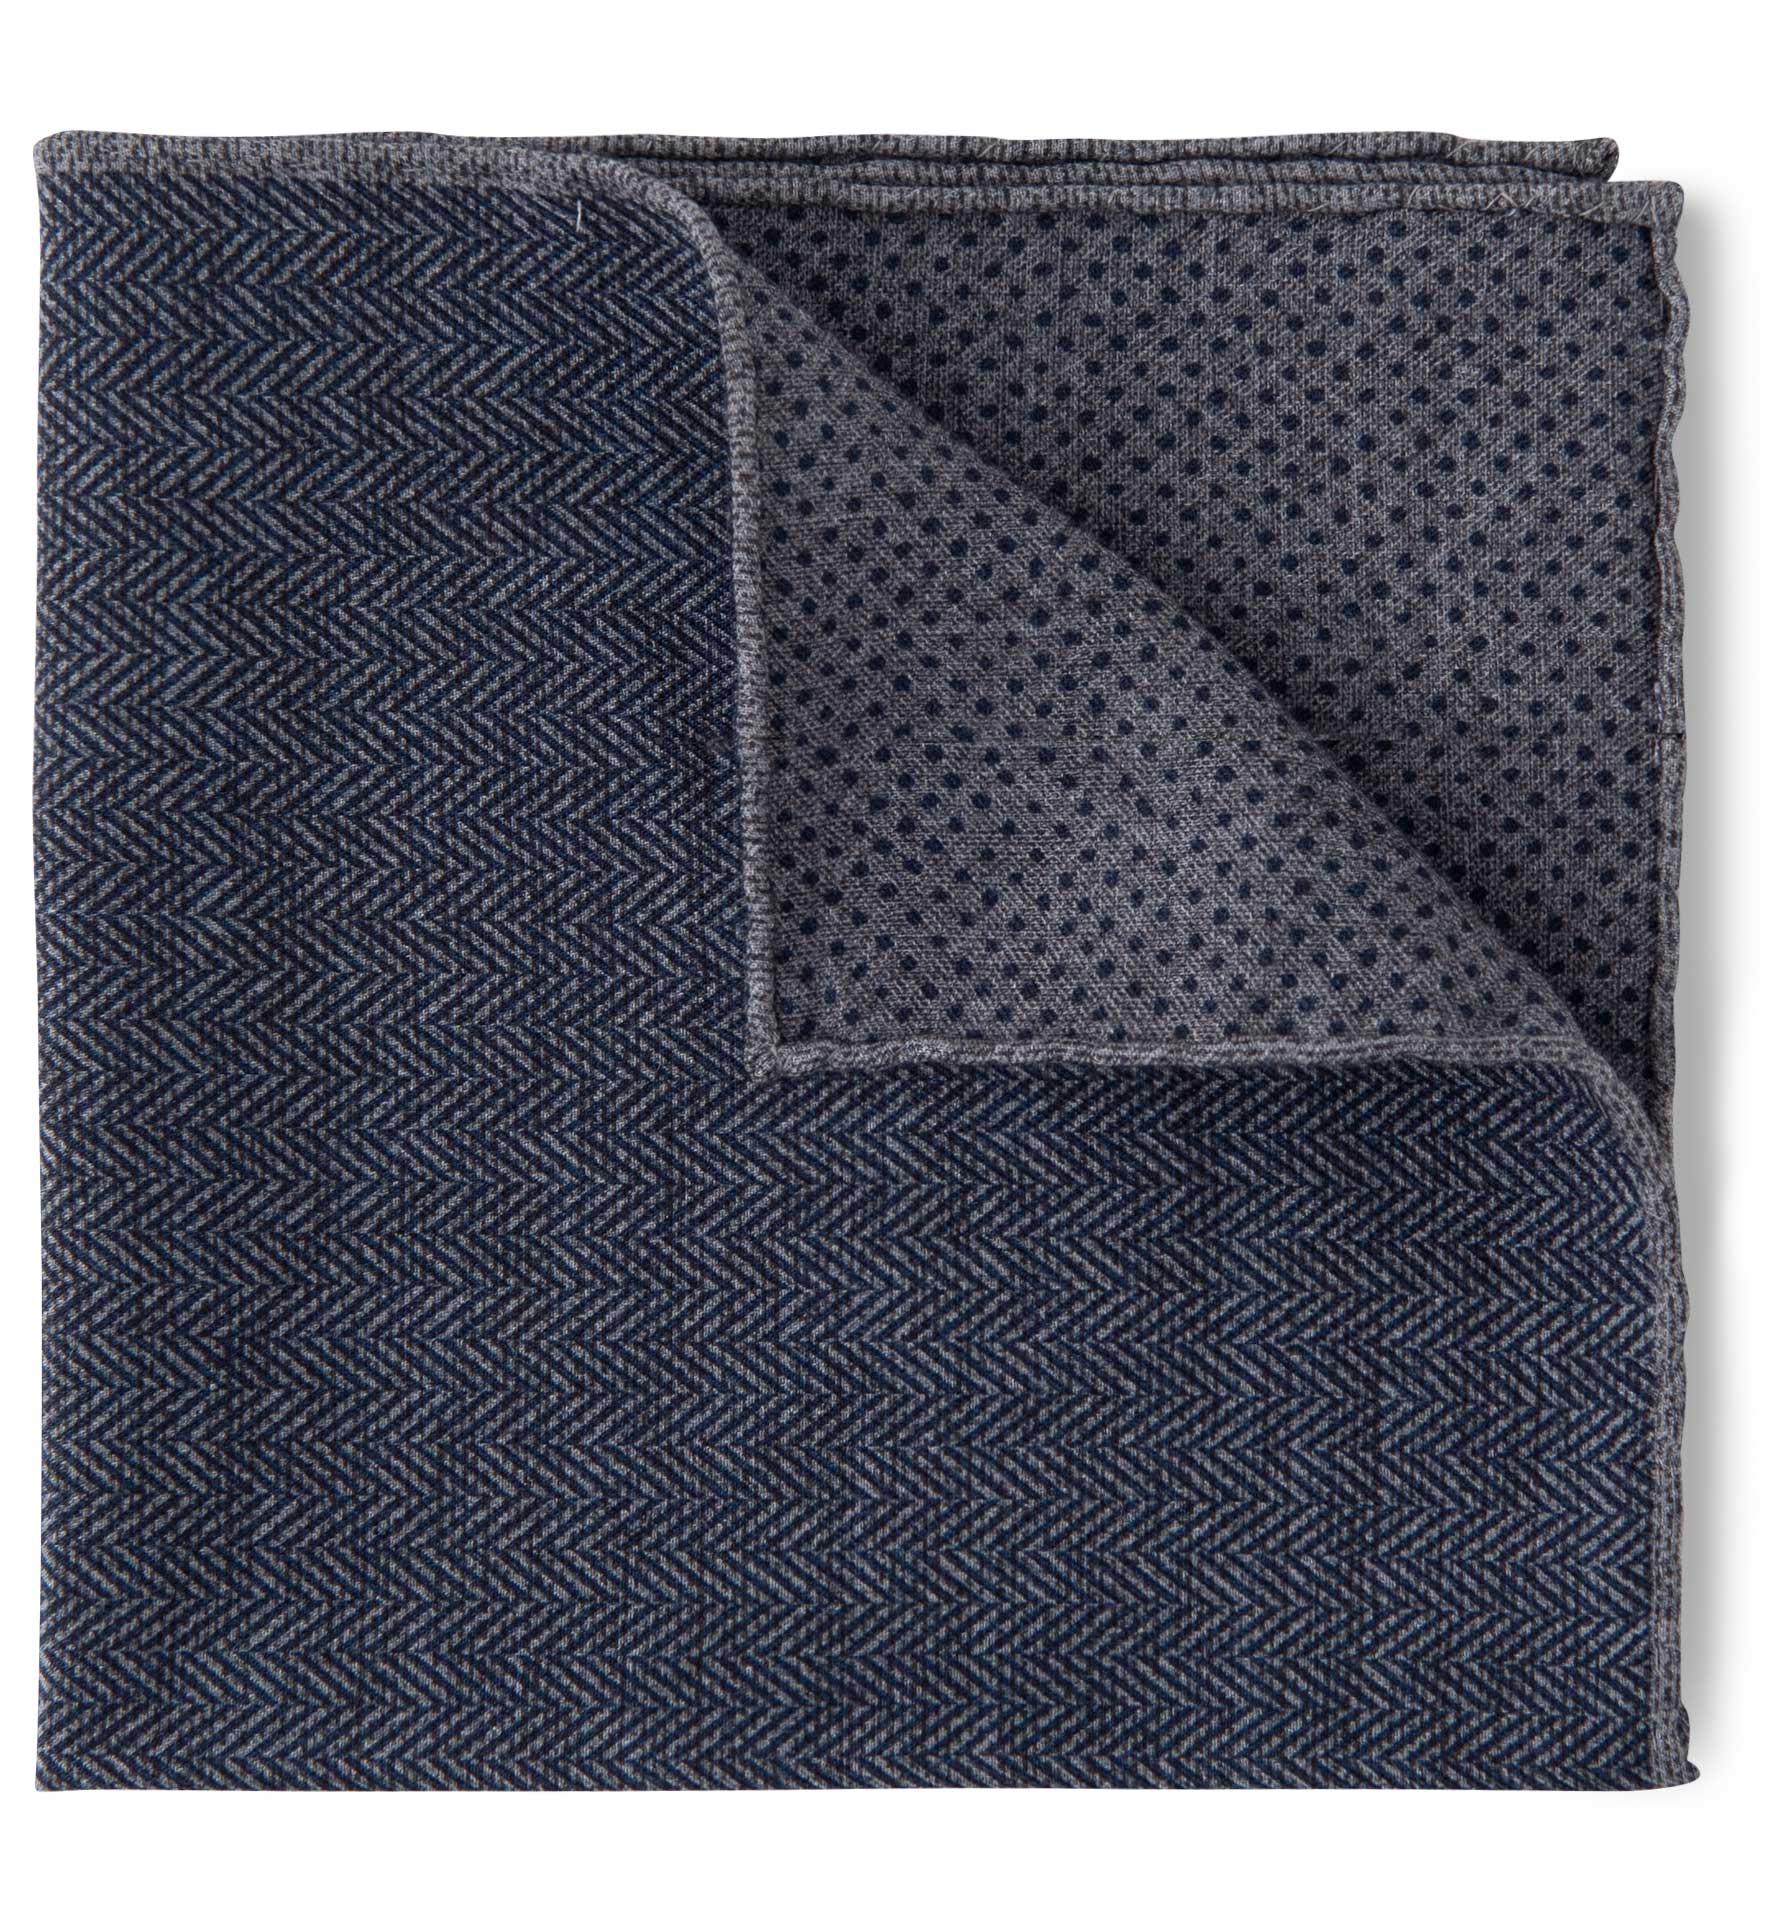 Zoom Image of Navy and Grey Herringbone Print Pocket Square